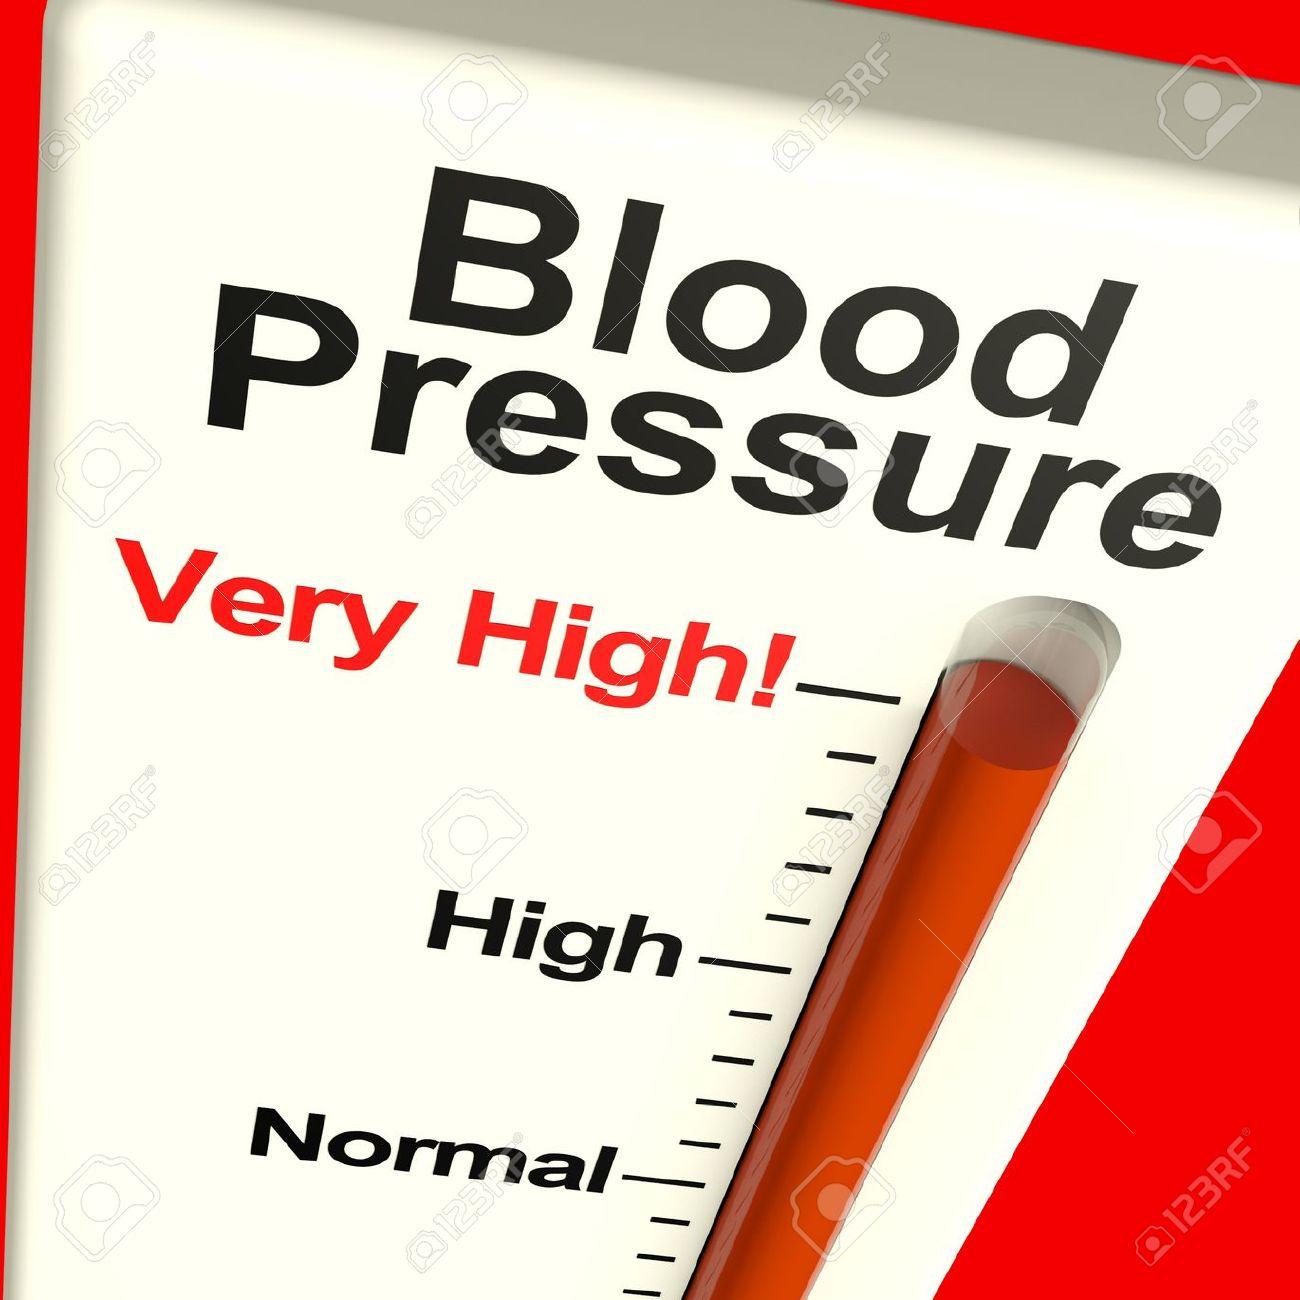 Clipart high blood pressure.